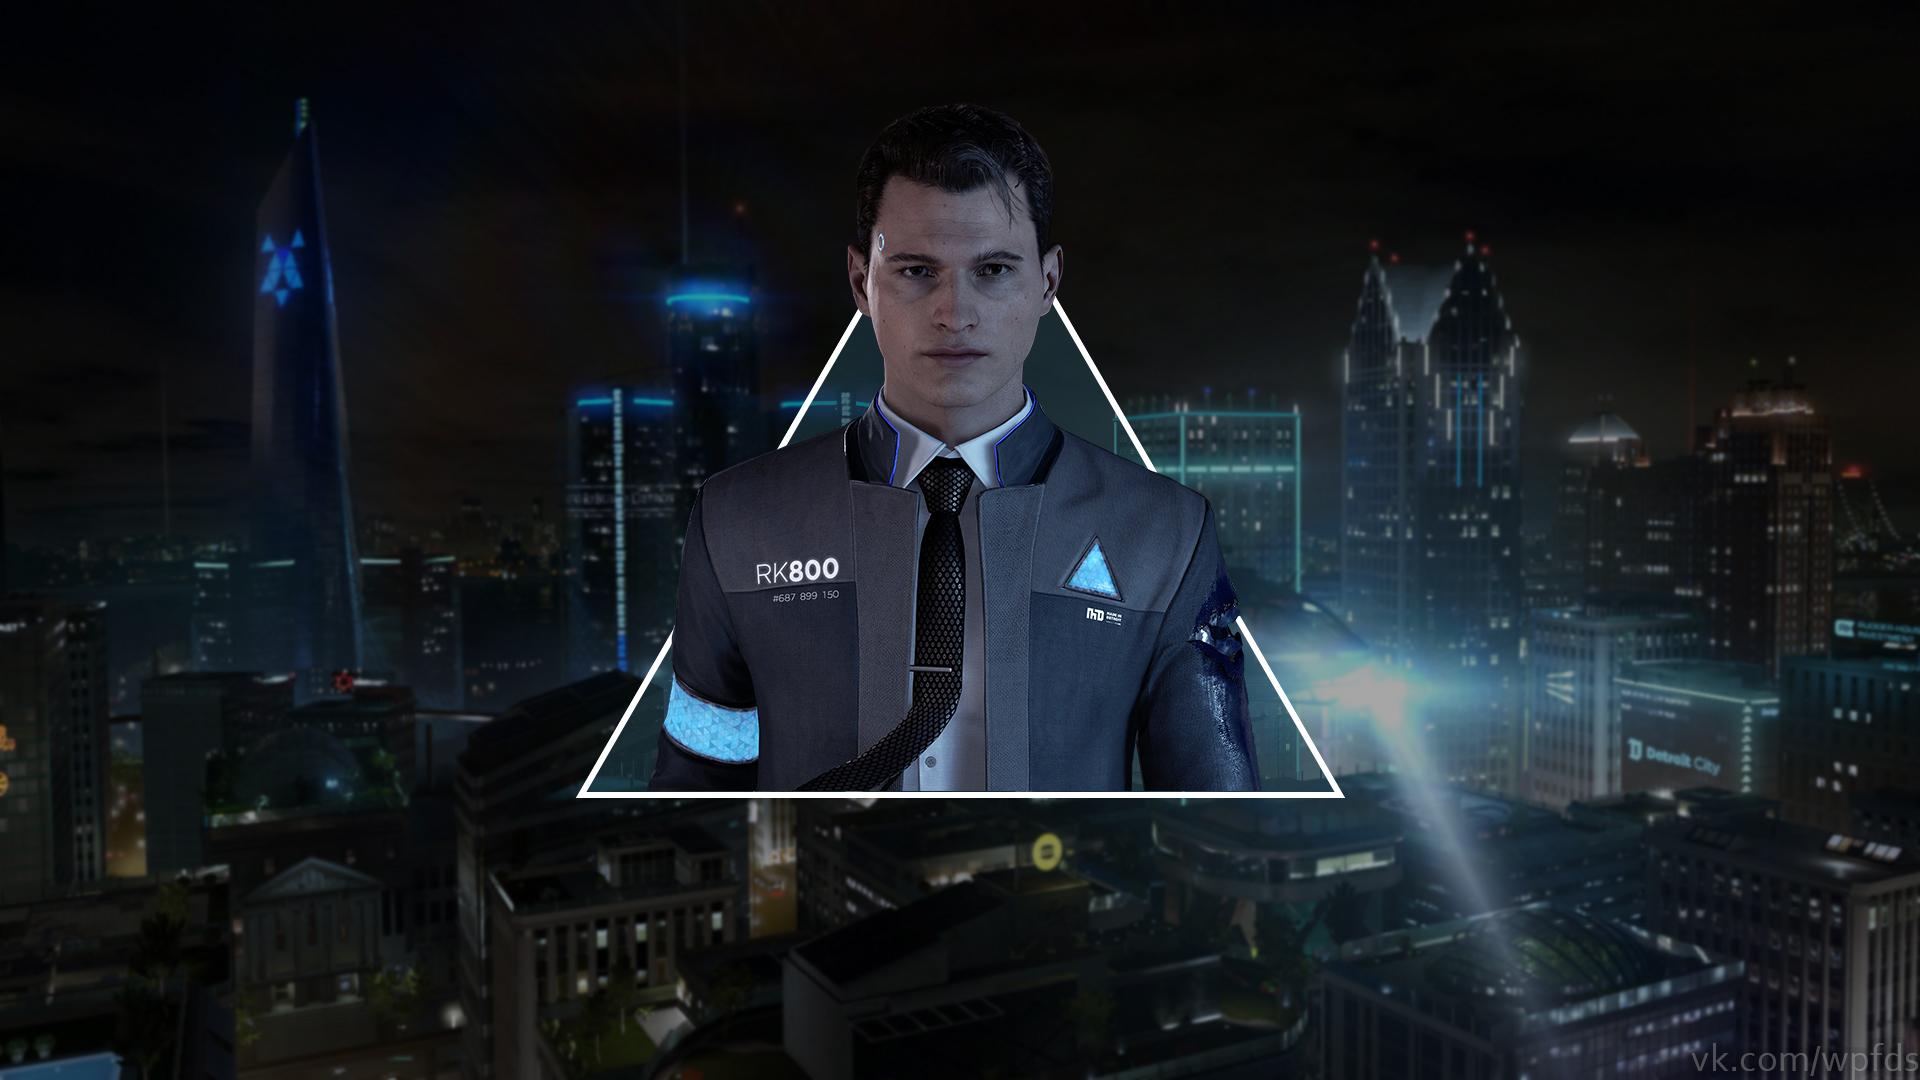 Connor Detroit Become Human Wallpaper: Wallpaper : Detroit Become Human, Connor, Video Games